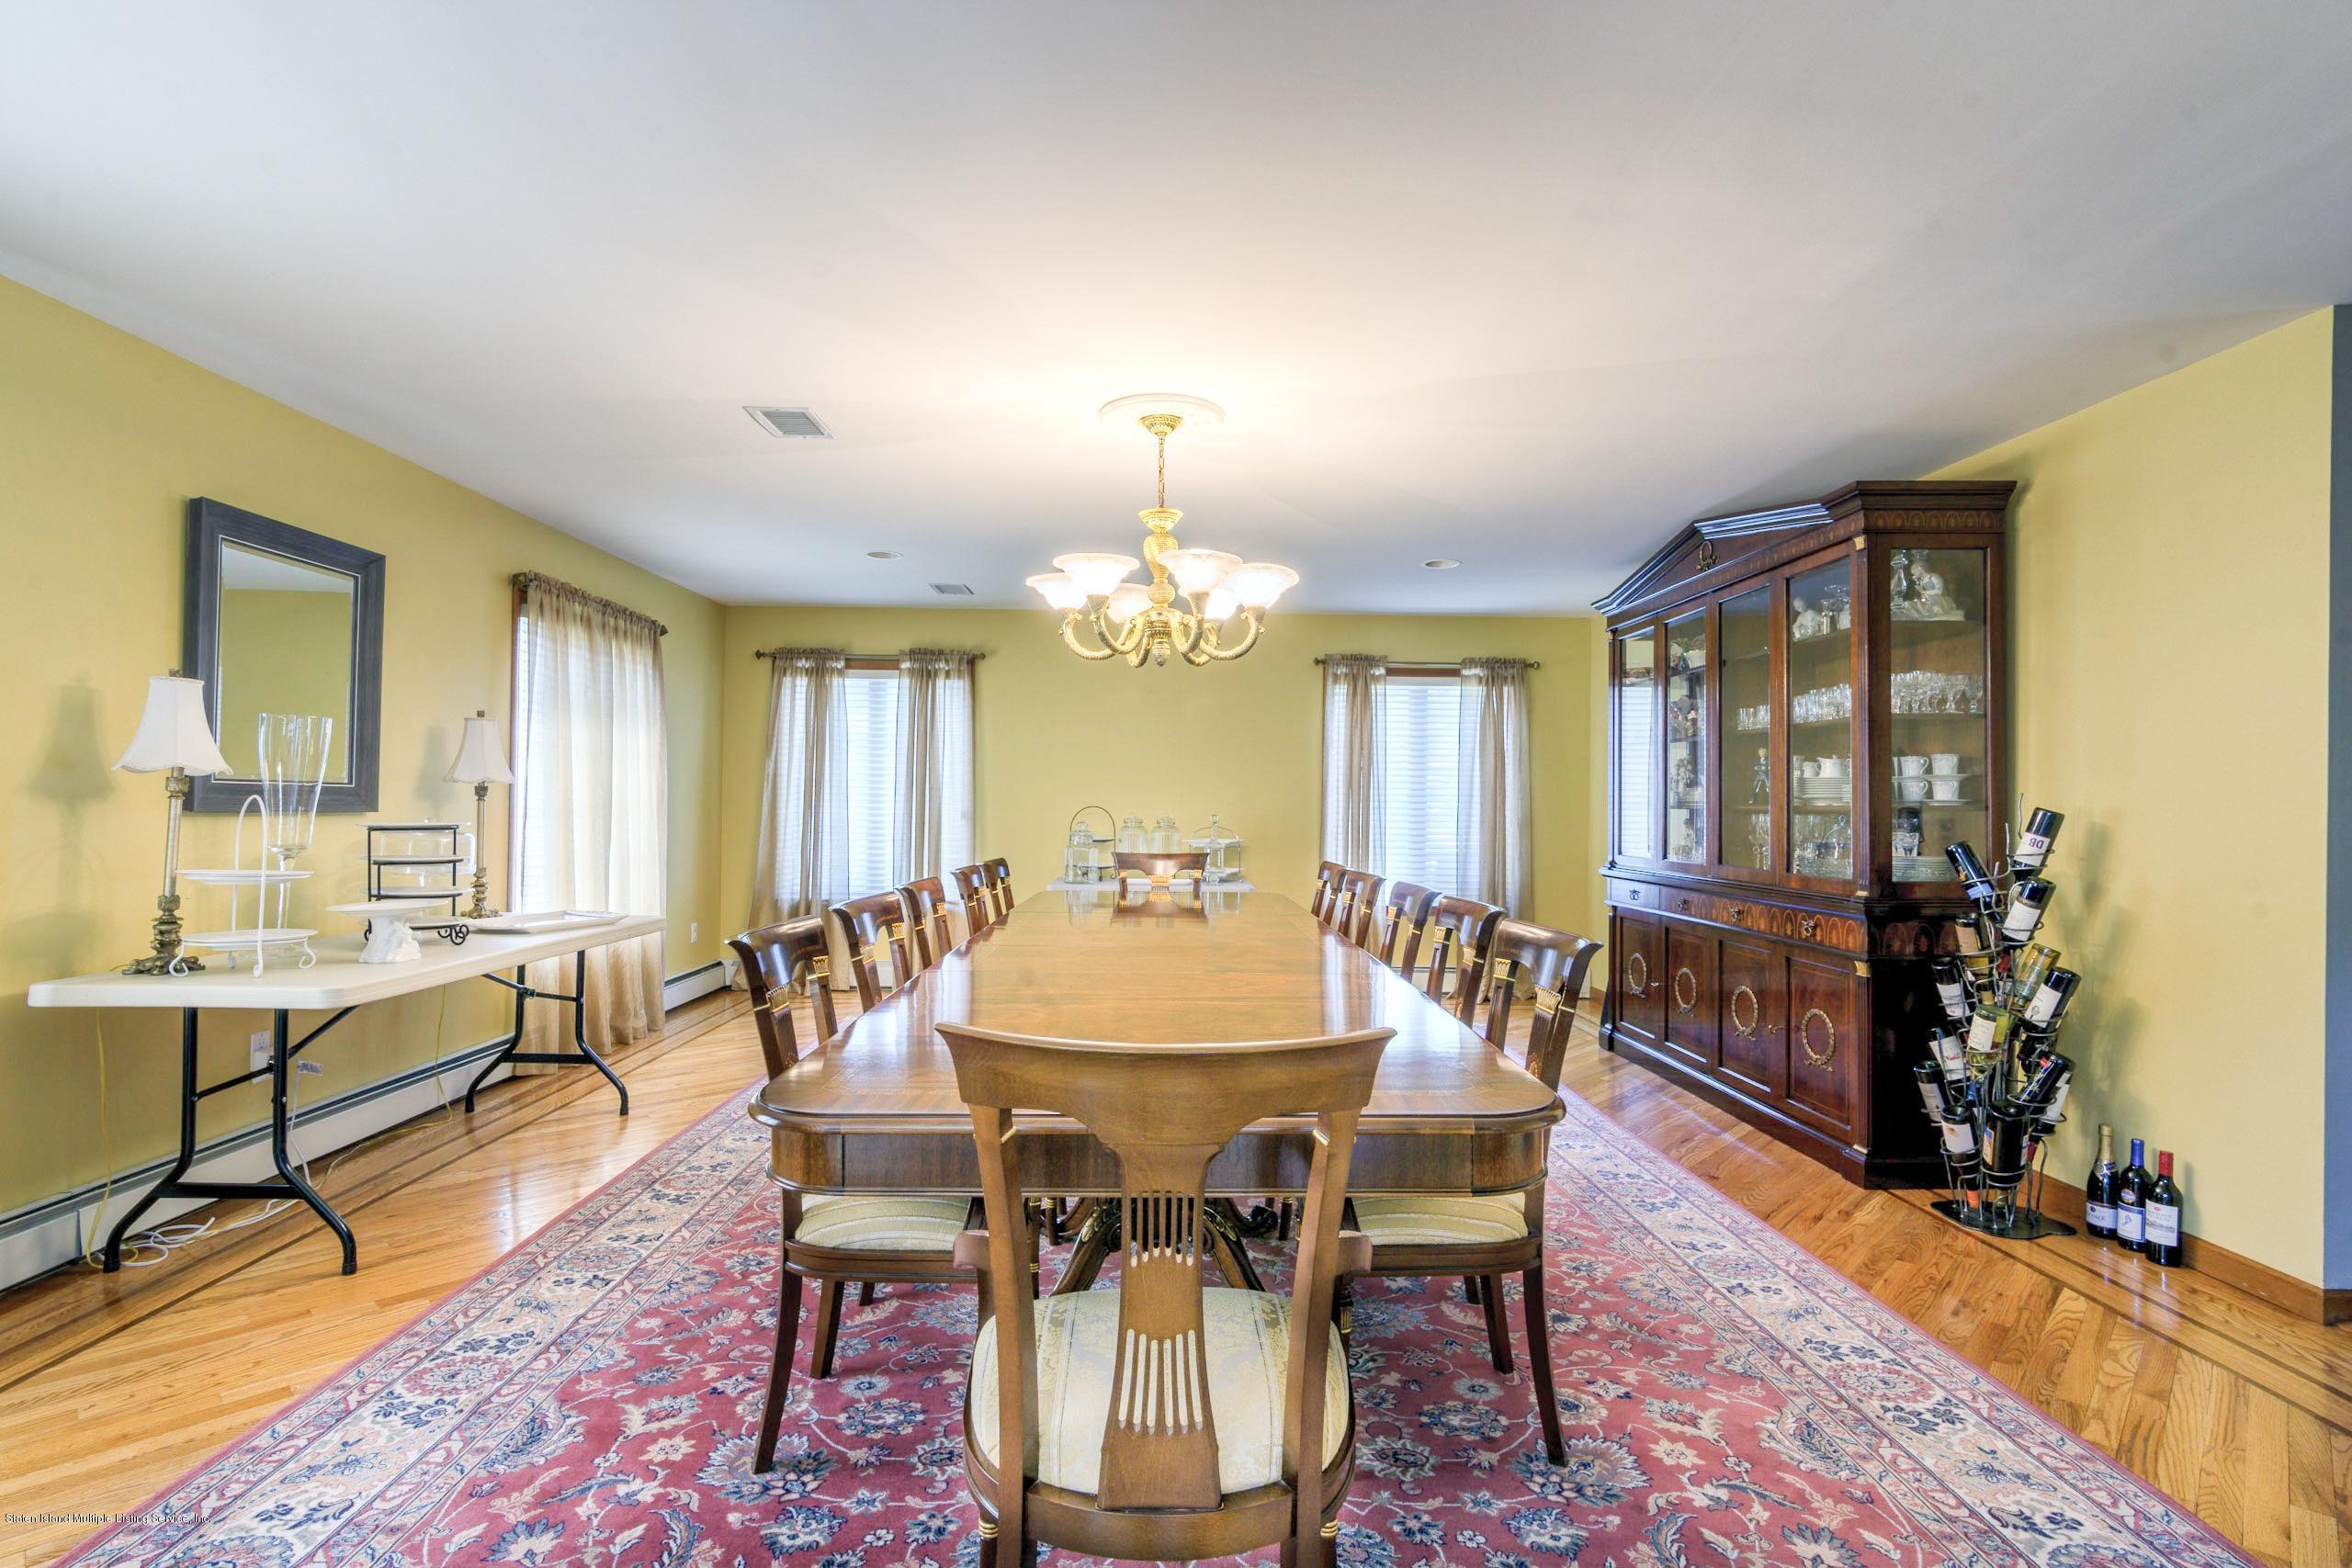 Single Family - Detached 120 Milden Avenue  Staten Island, NY 10301, MLS-1121068-7